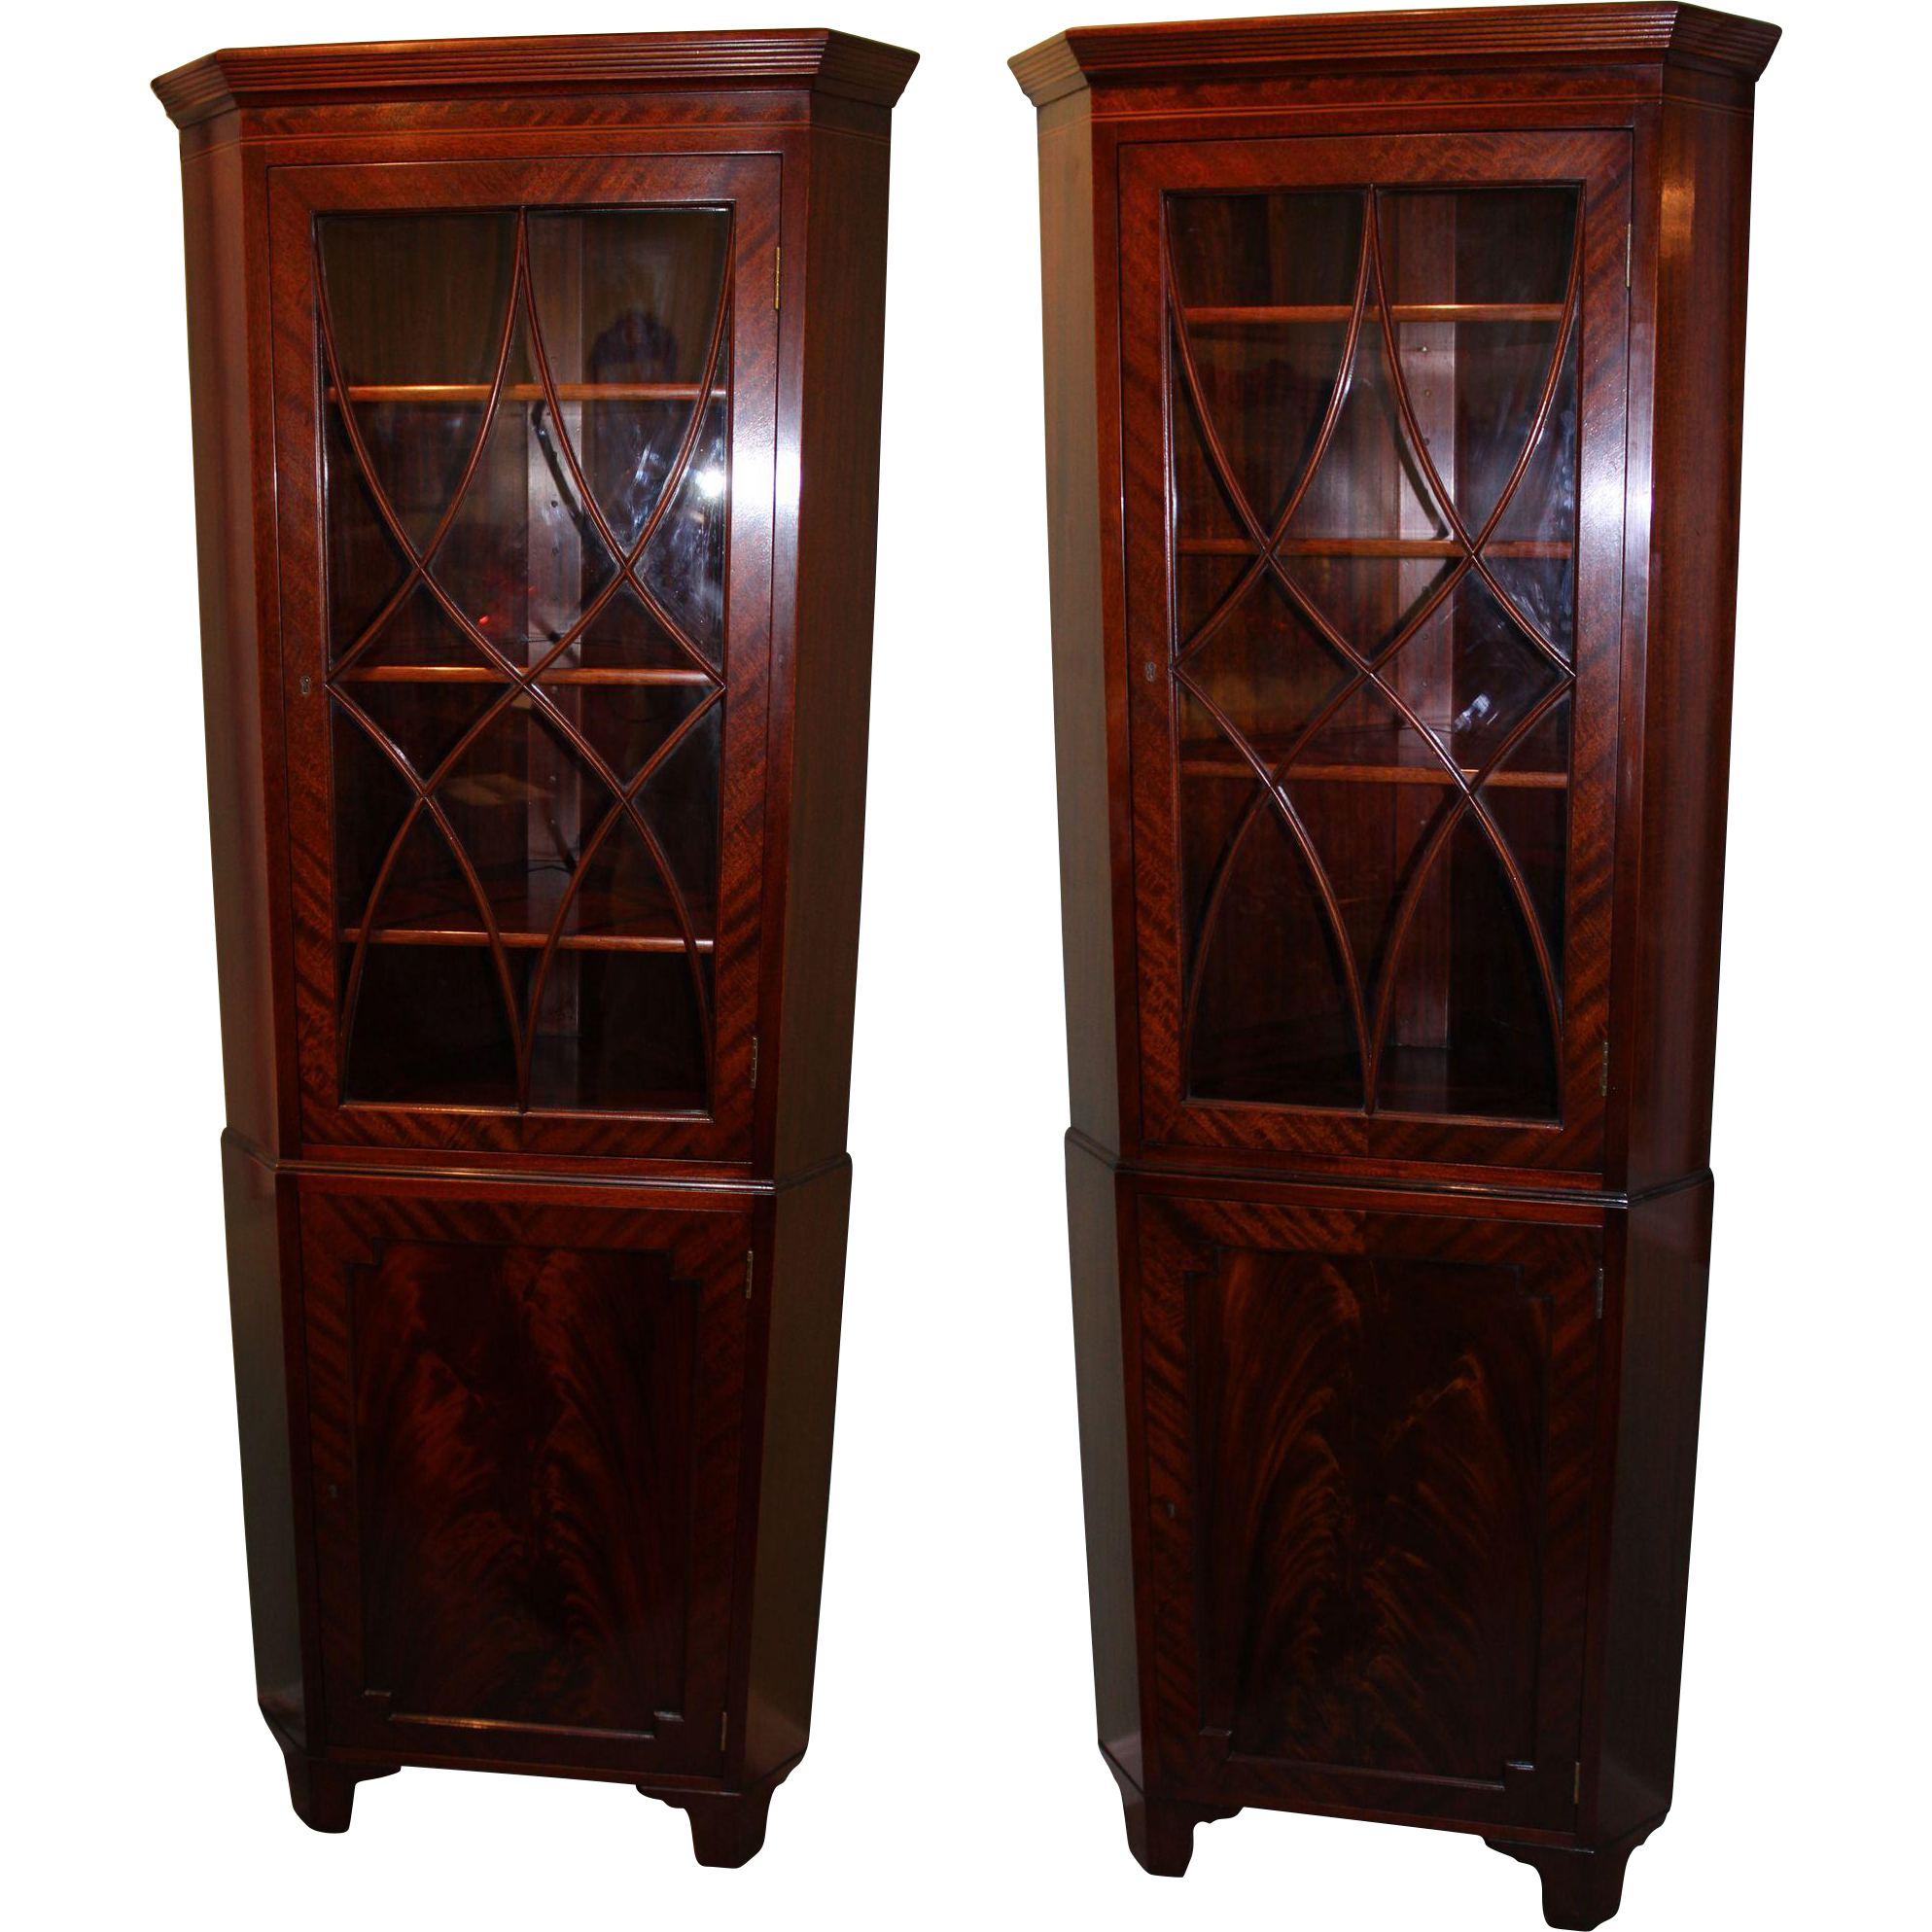 Pair Of Sheraton Style Mahogany Corner Cabinets By Old Colony, Boston MA